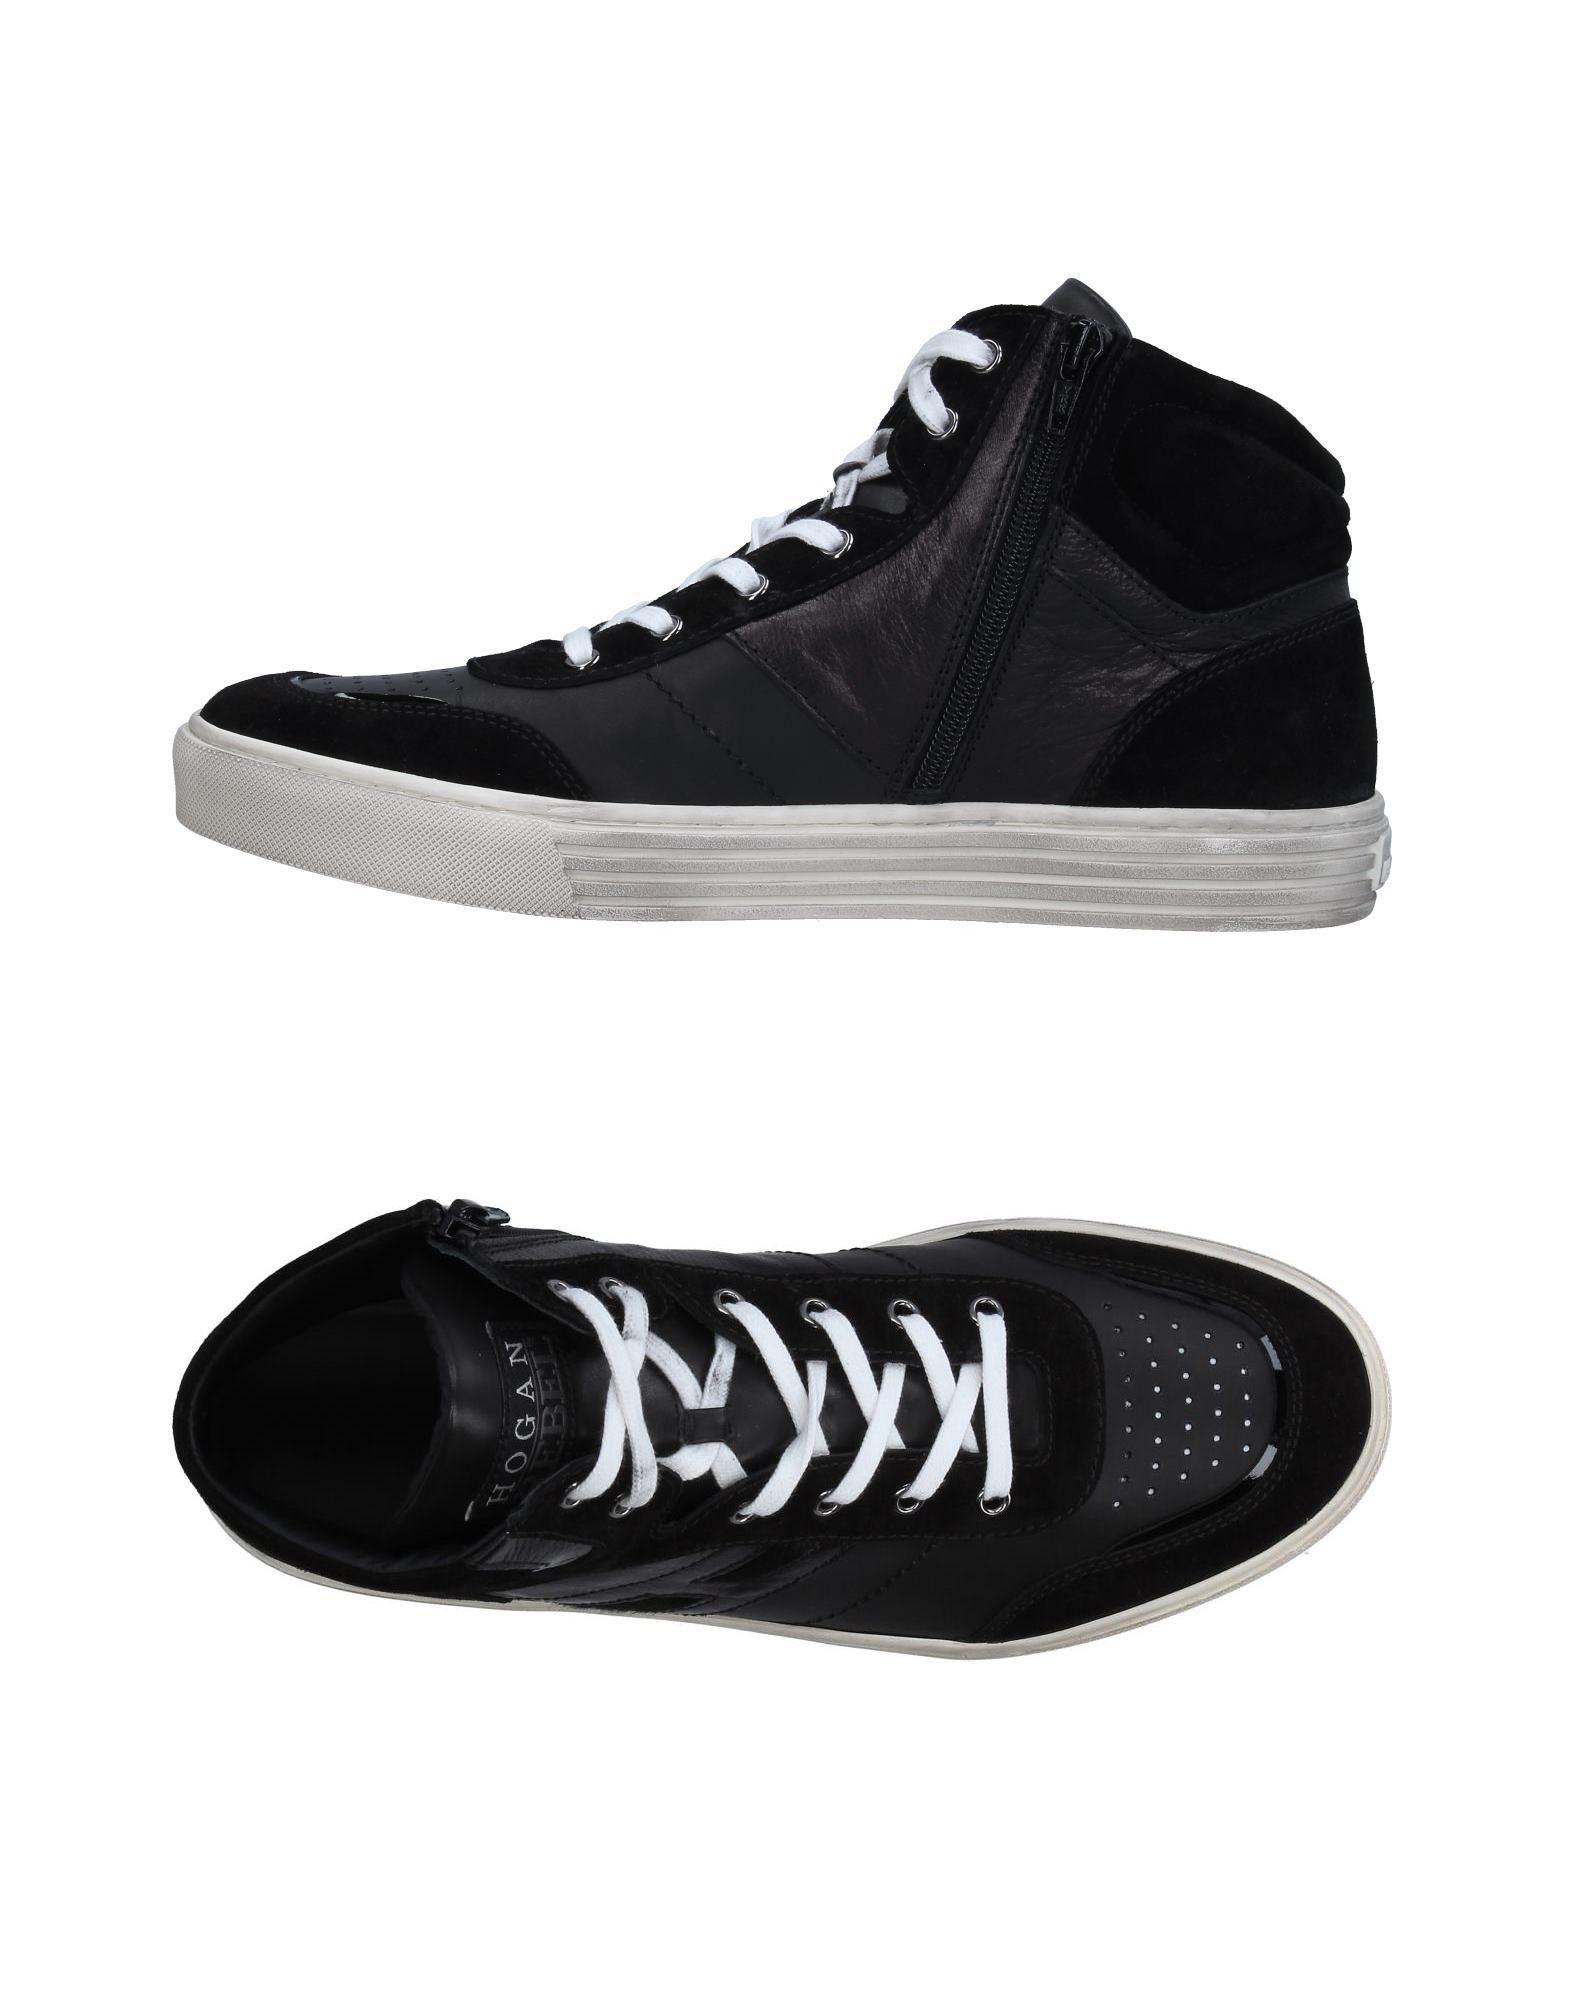 Hogan Rebel Sneakers Herren  11303404KI Gute Qualität beliebte Schuhe